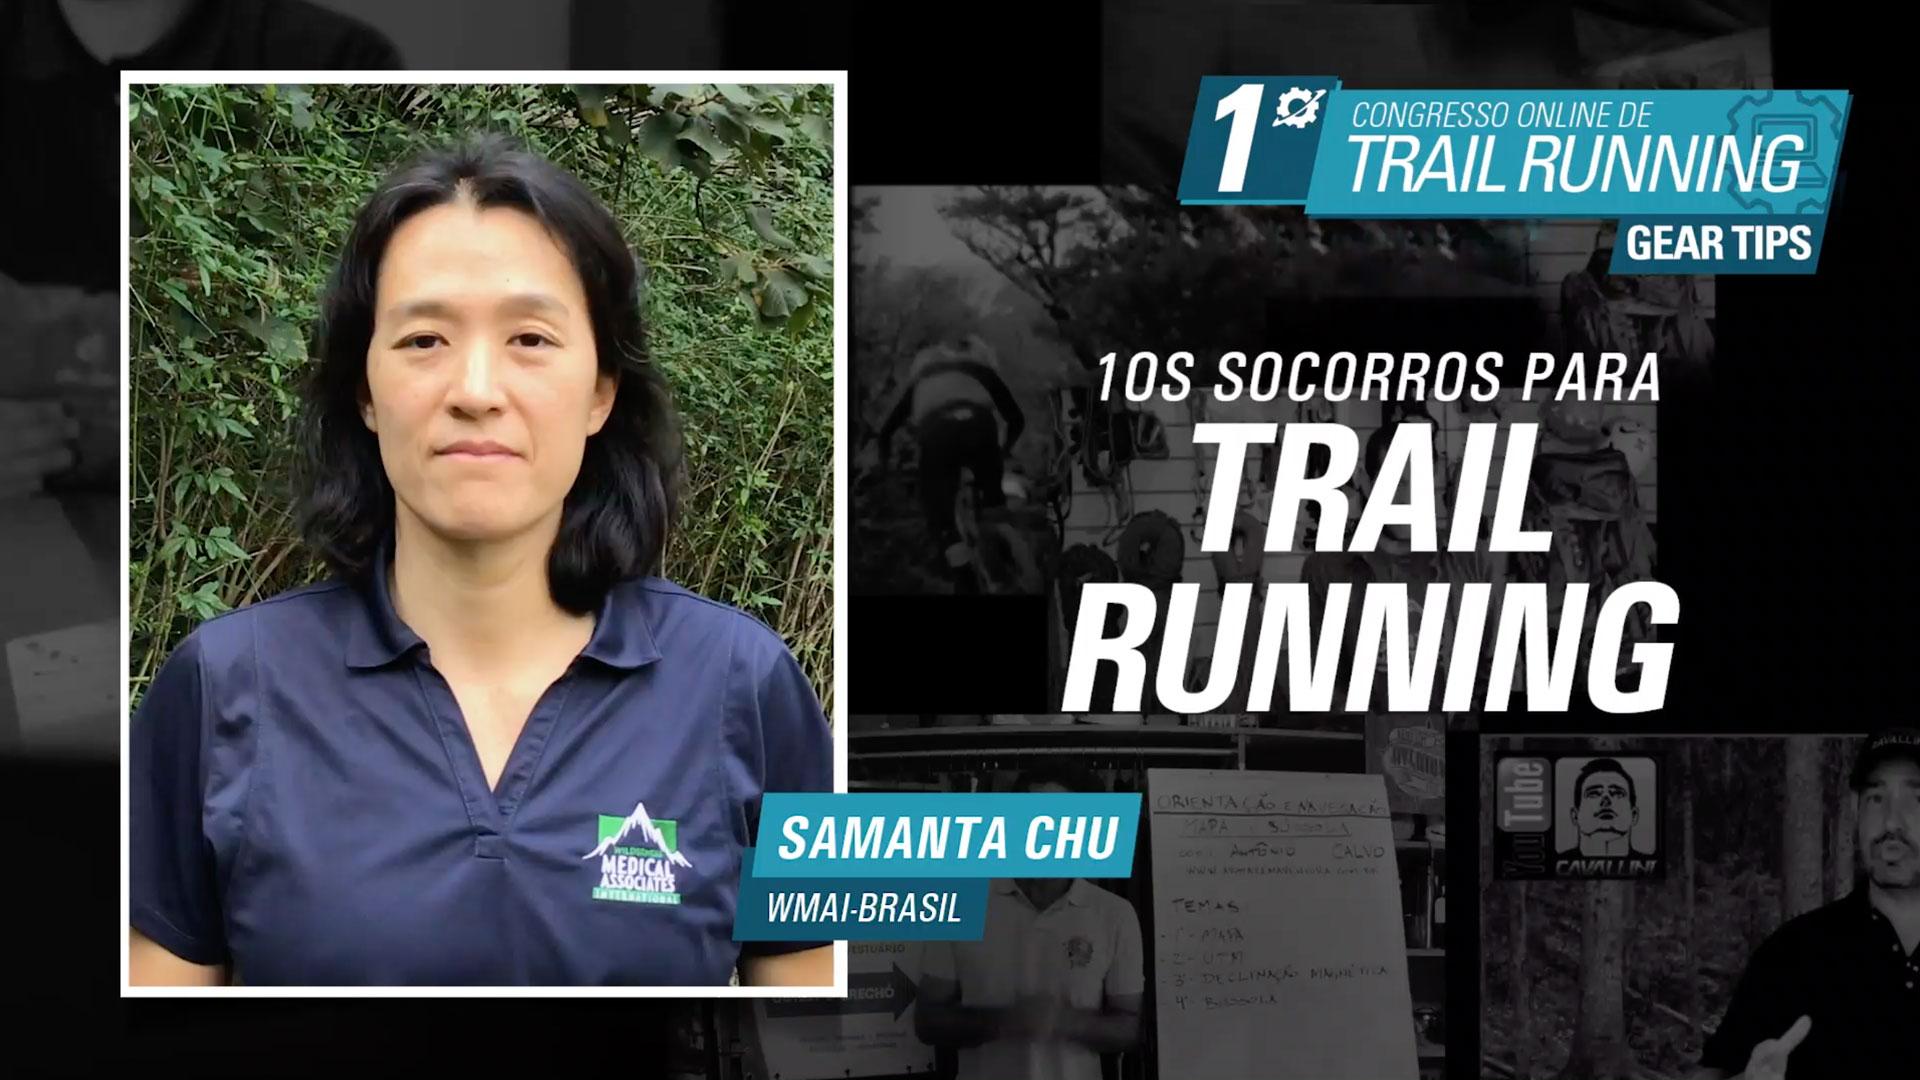 1ºs Socorros para Trail Running - Samanta Chu